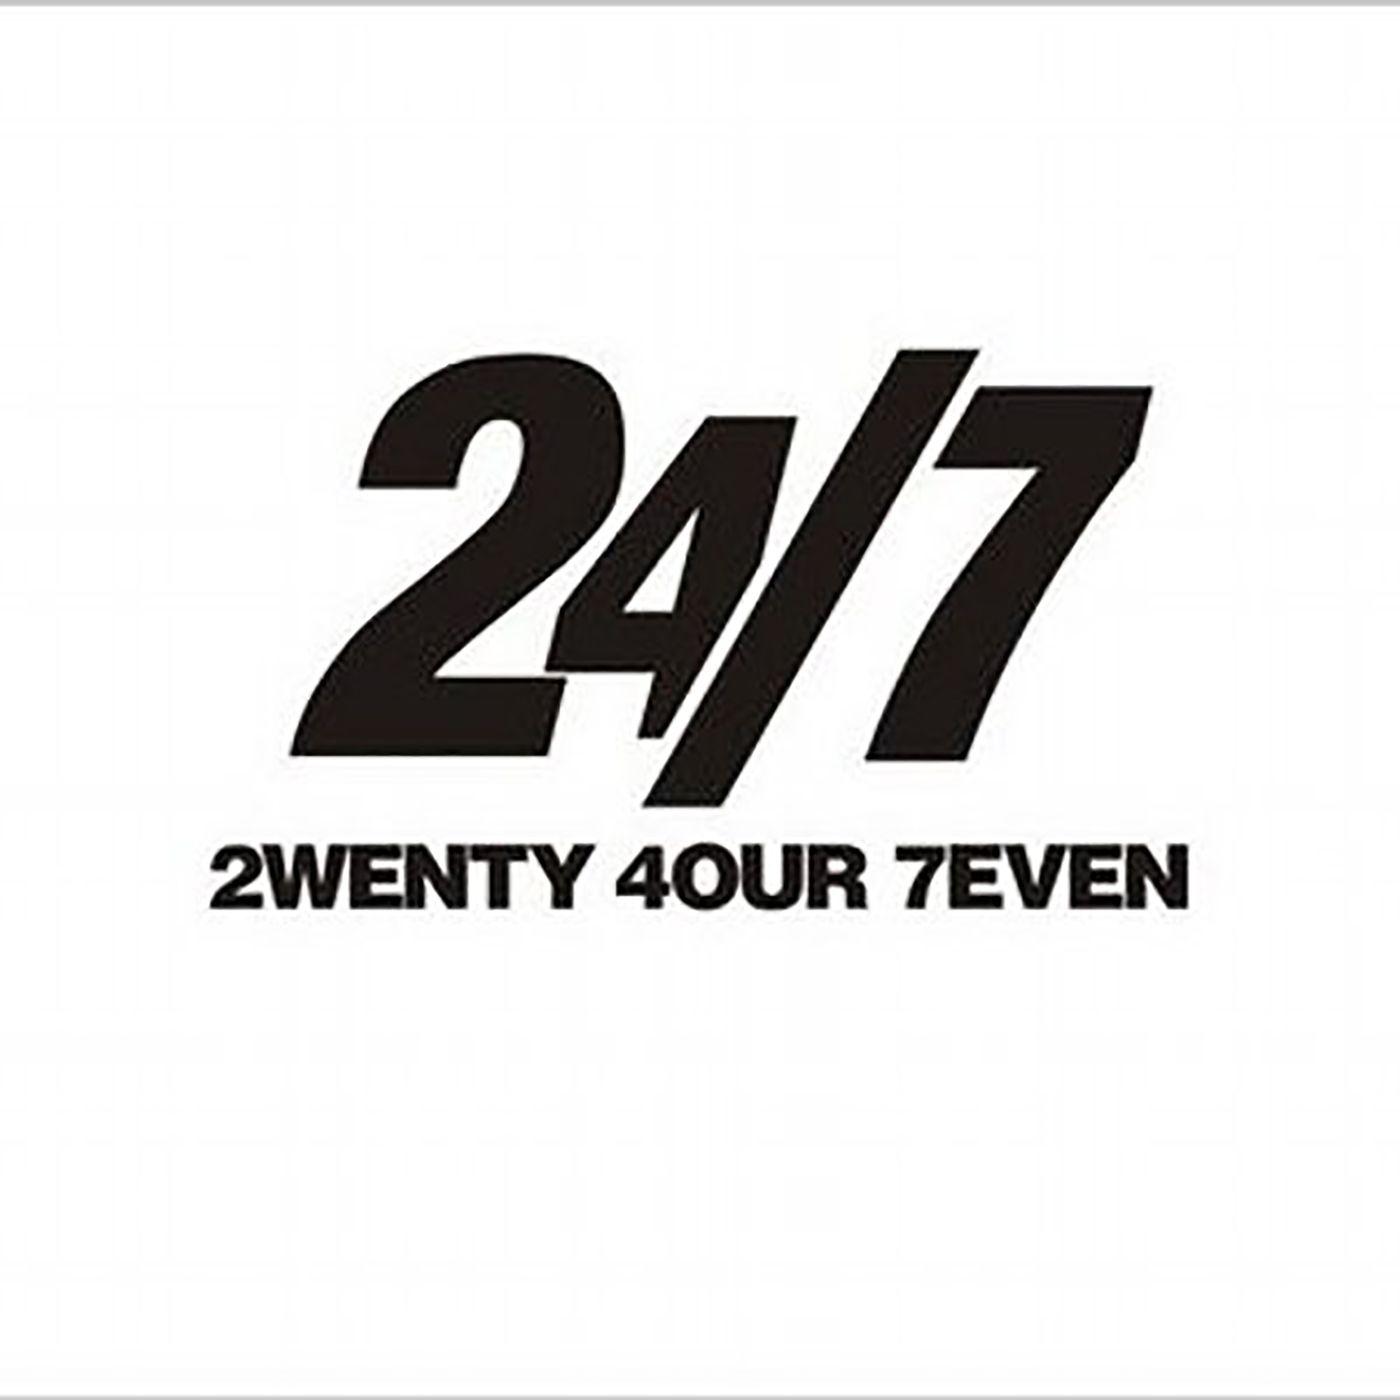 071 Twenty 4 Seven - I Love the Music